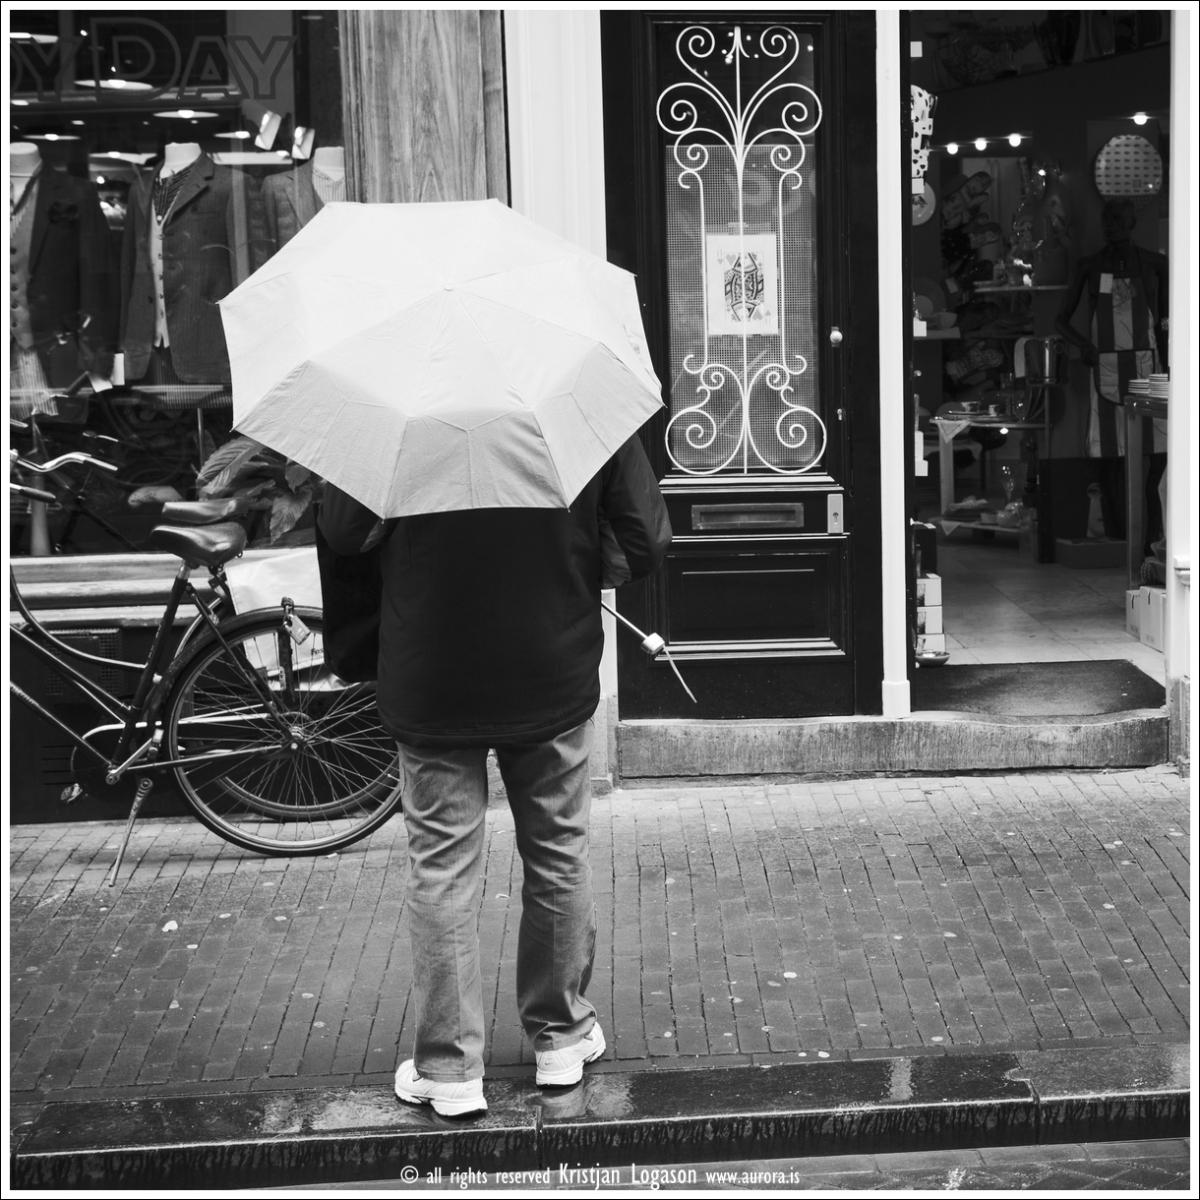 Man with umbrella - Amsterdam